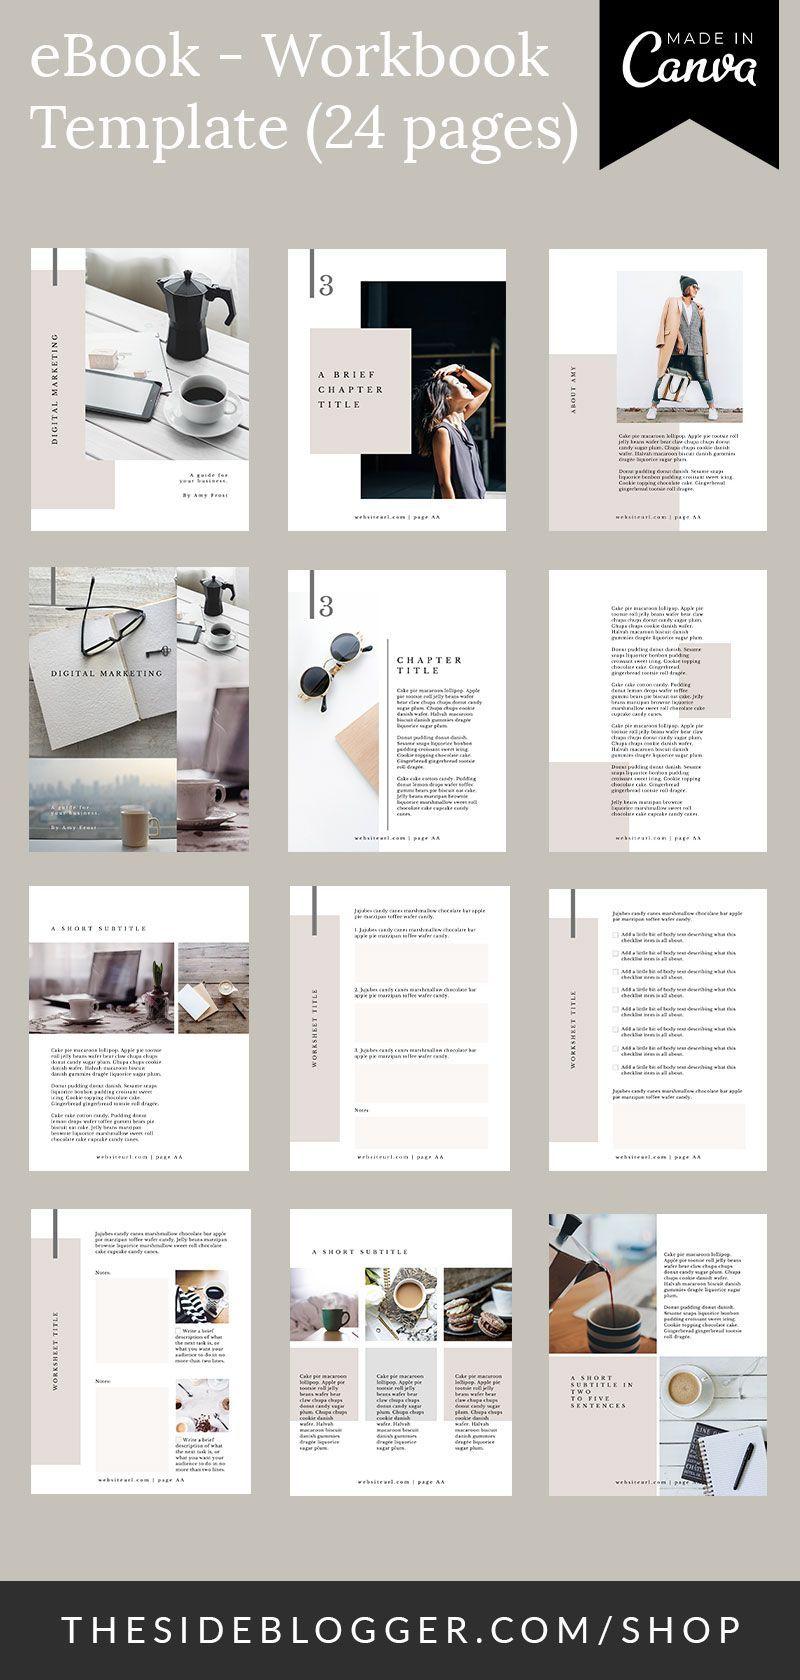 Bloggers Canva Creators Ebookworkbook Online Pages Template Ebook Workbook Canva Template 24 Pages For Blogger Broschure Design Web Design Broschure